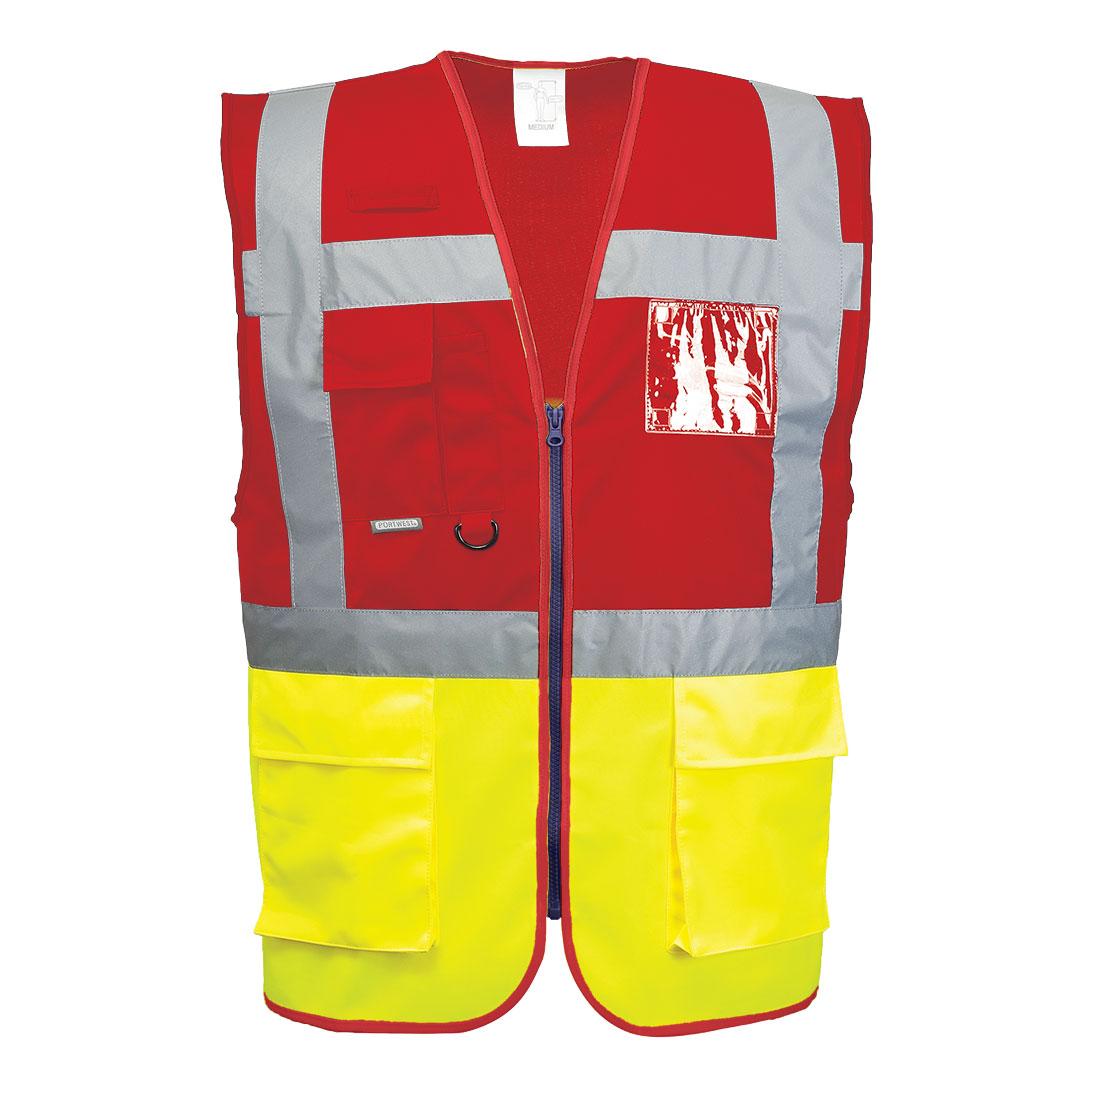 Paris Executive Vest Yellow/Red XL